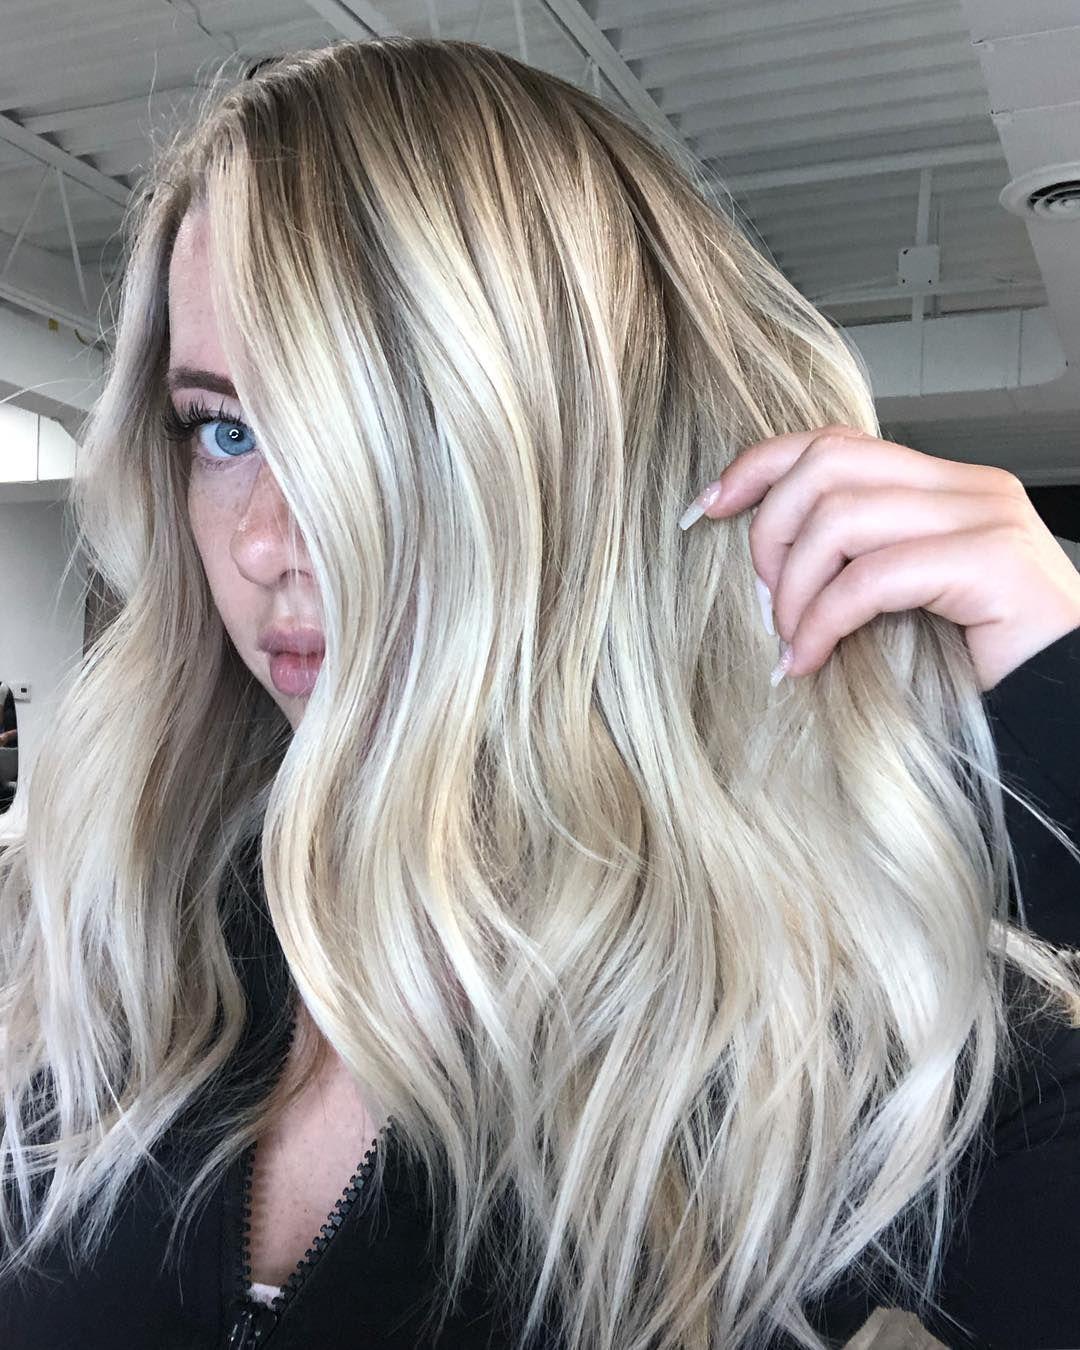 Perfect Swift Soft Beach Waves in 2020 Hair crimper